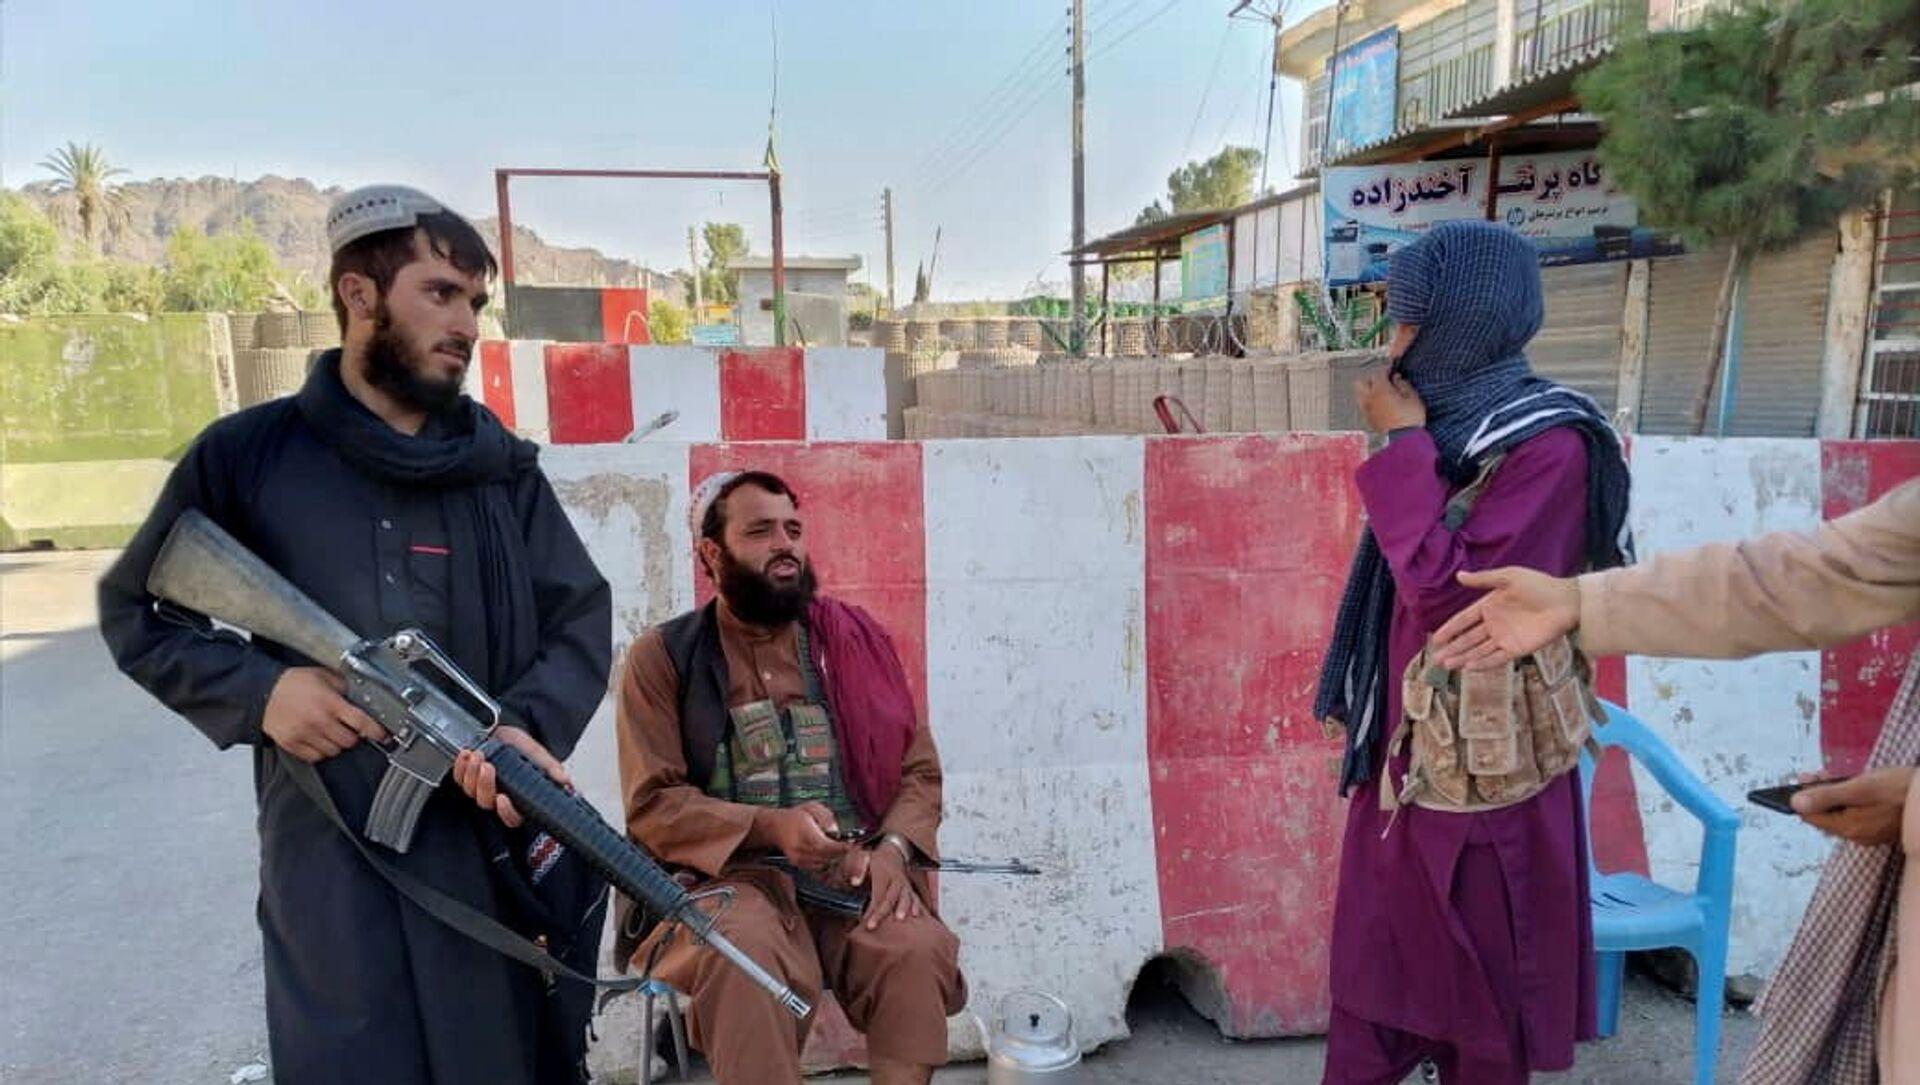 Боевики Талибана охраняют блокпост в Фарахе, Афганистан, 11 августа 2021 года. - Sputnik Абхазия, 1920, 13.08.2021